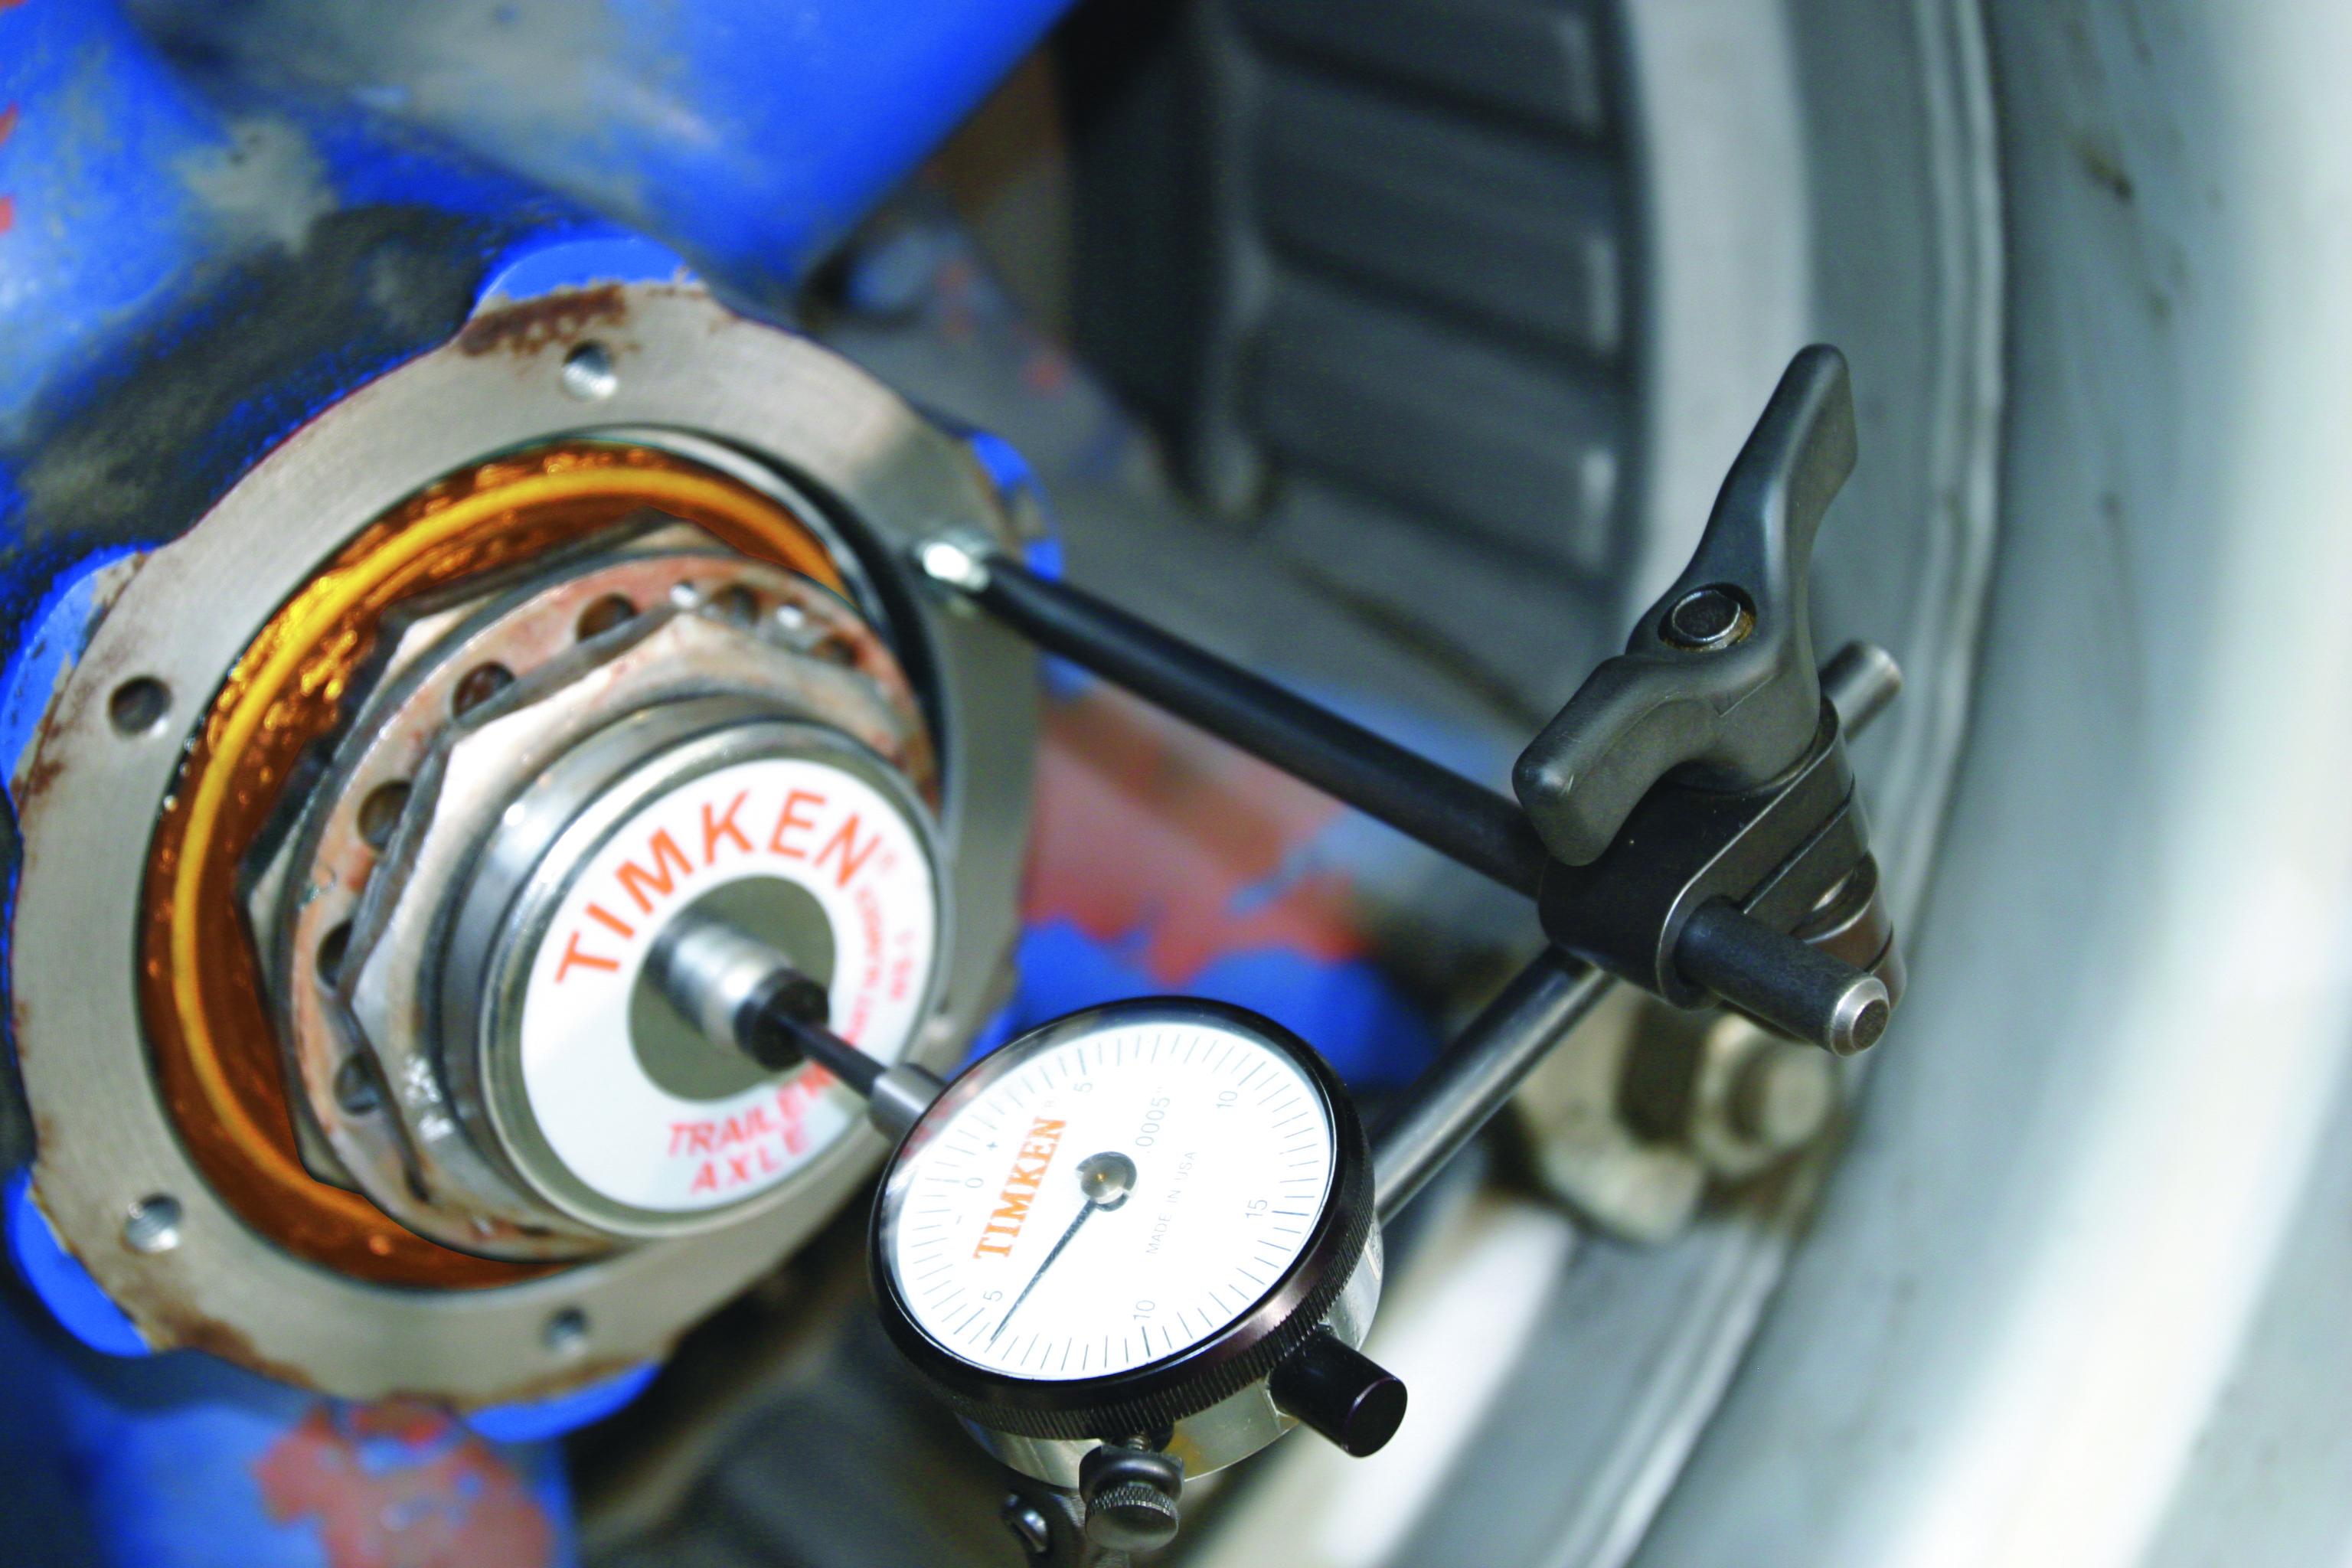 Bearing Adjustment Basics Know Your Parts